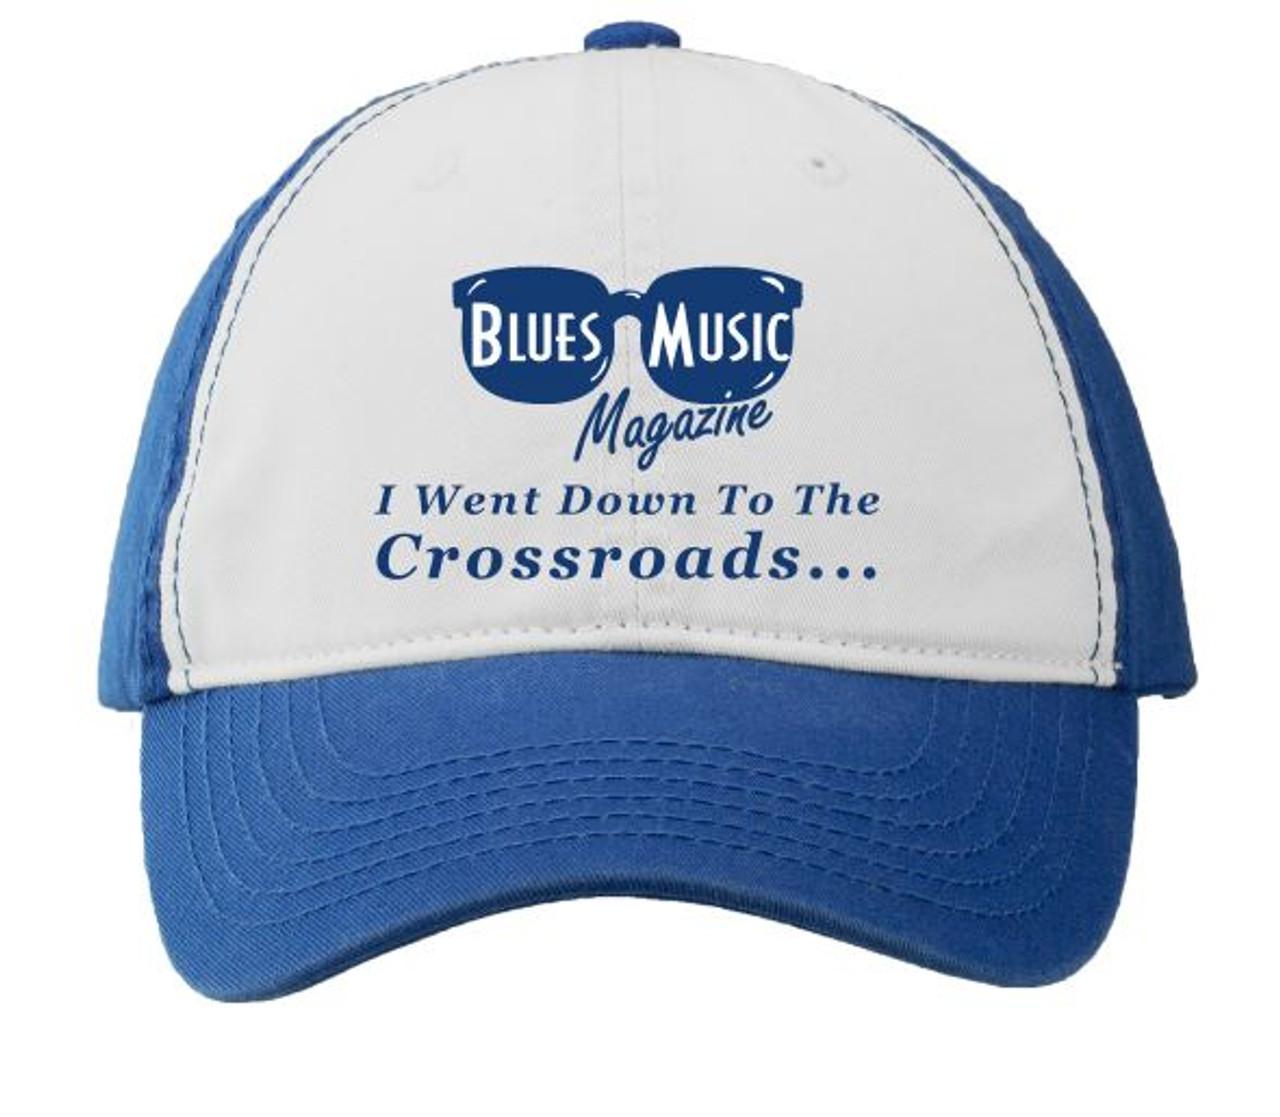 BLUES MUSIC MAGAZINE CROSSROADS ROYAL